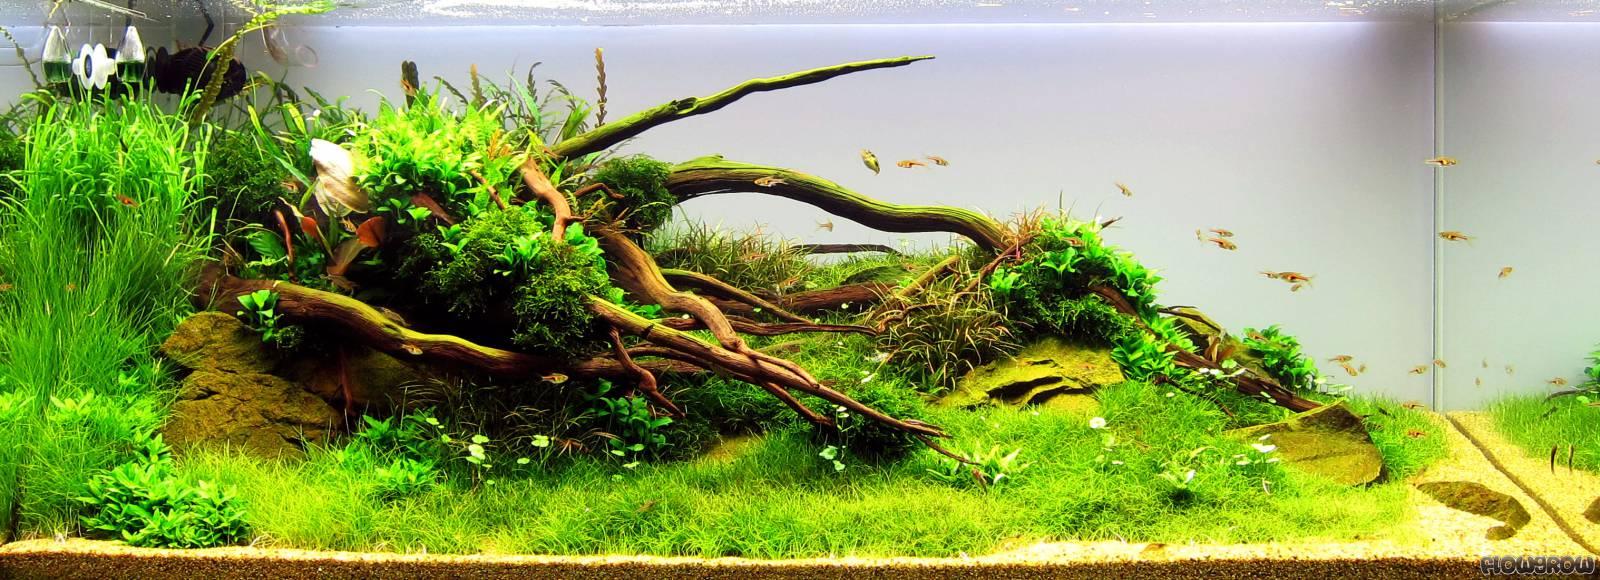 Below - Flowgrow Aquascape/Aquarium Database